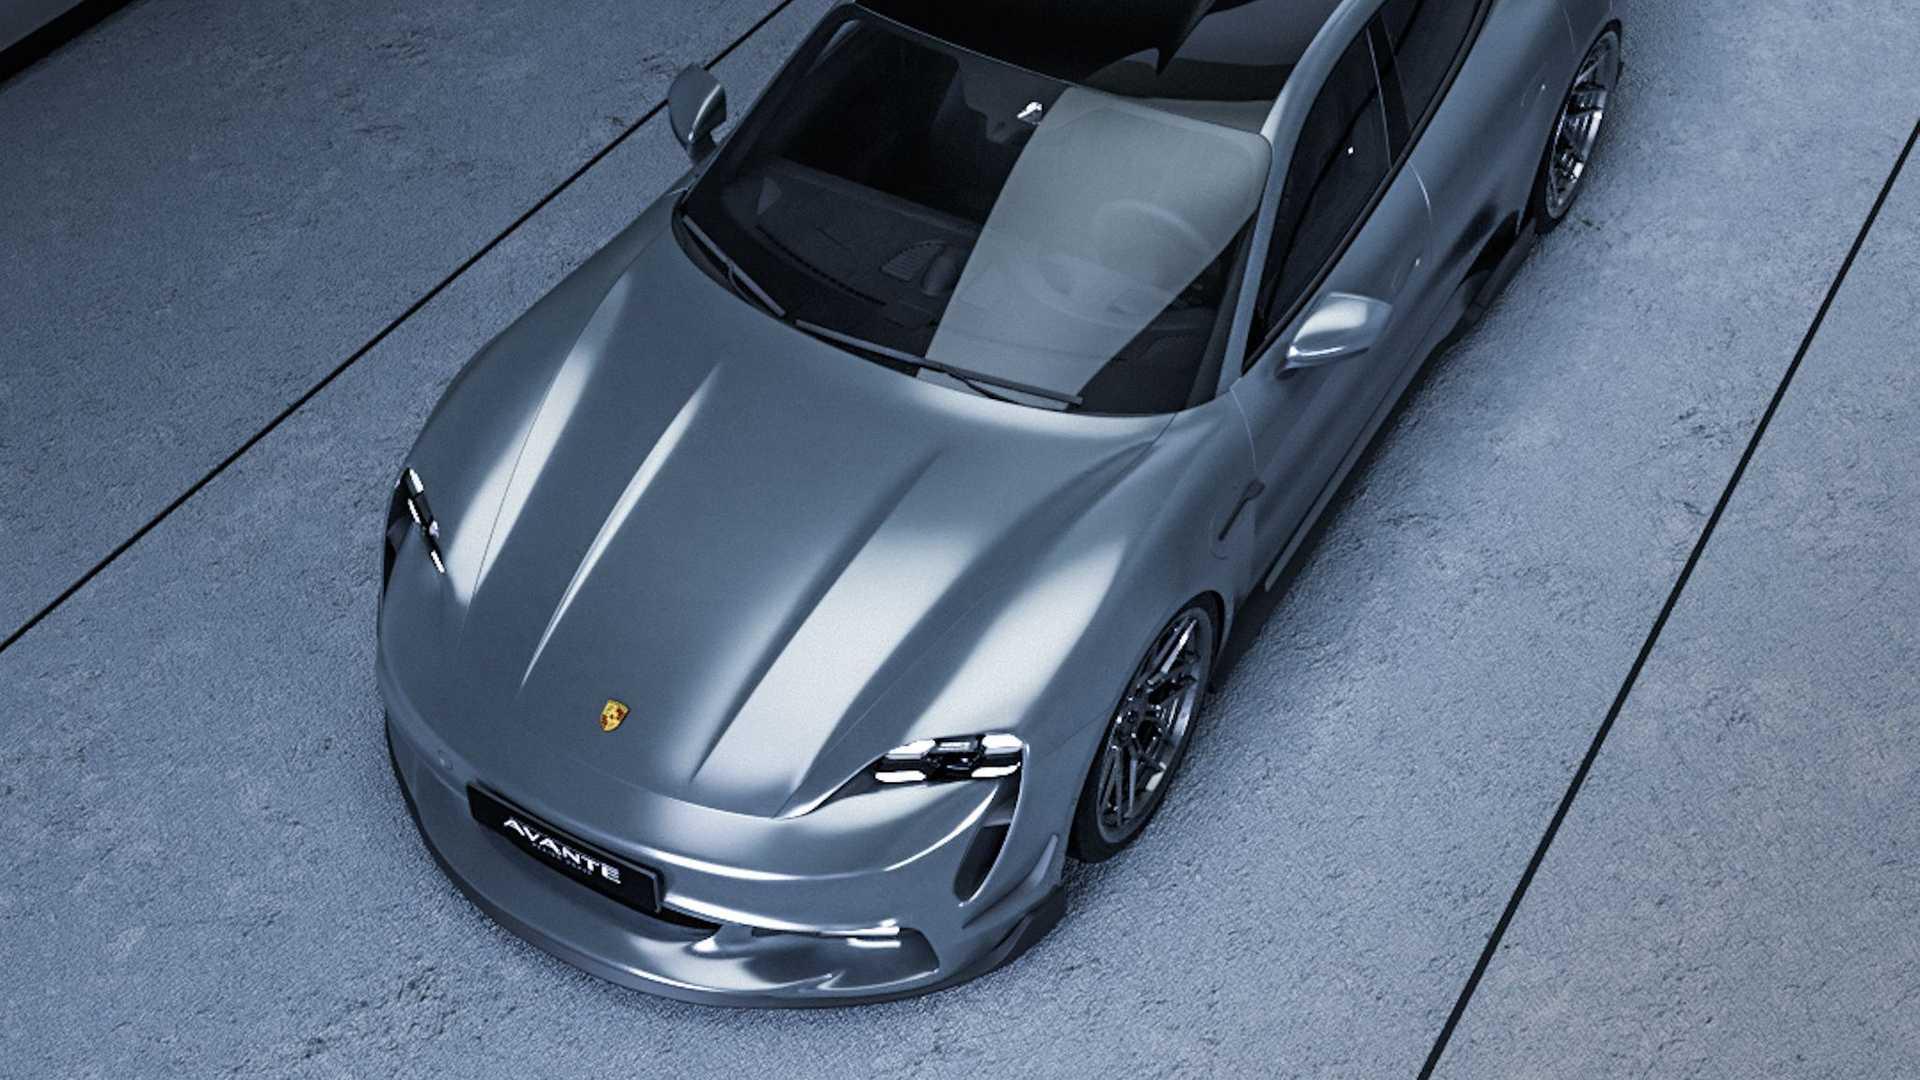 Porsche-Taycan-by-Avante-Design-12